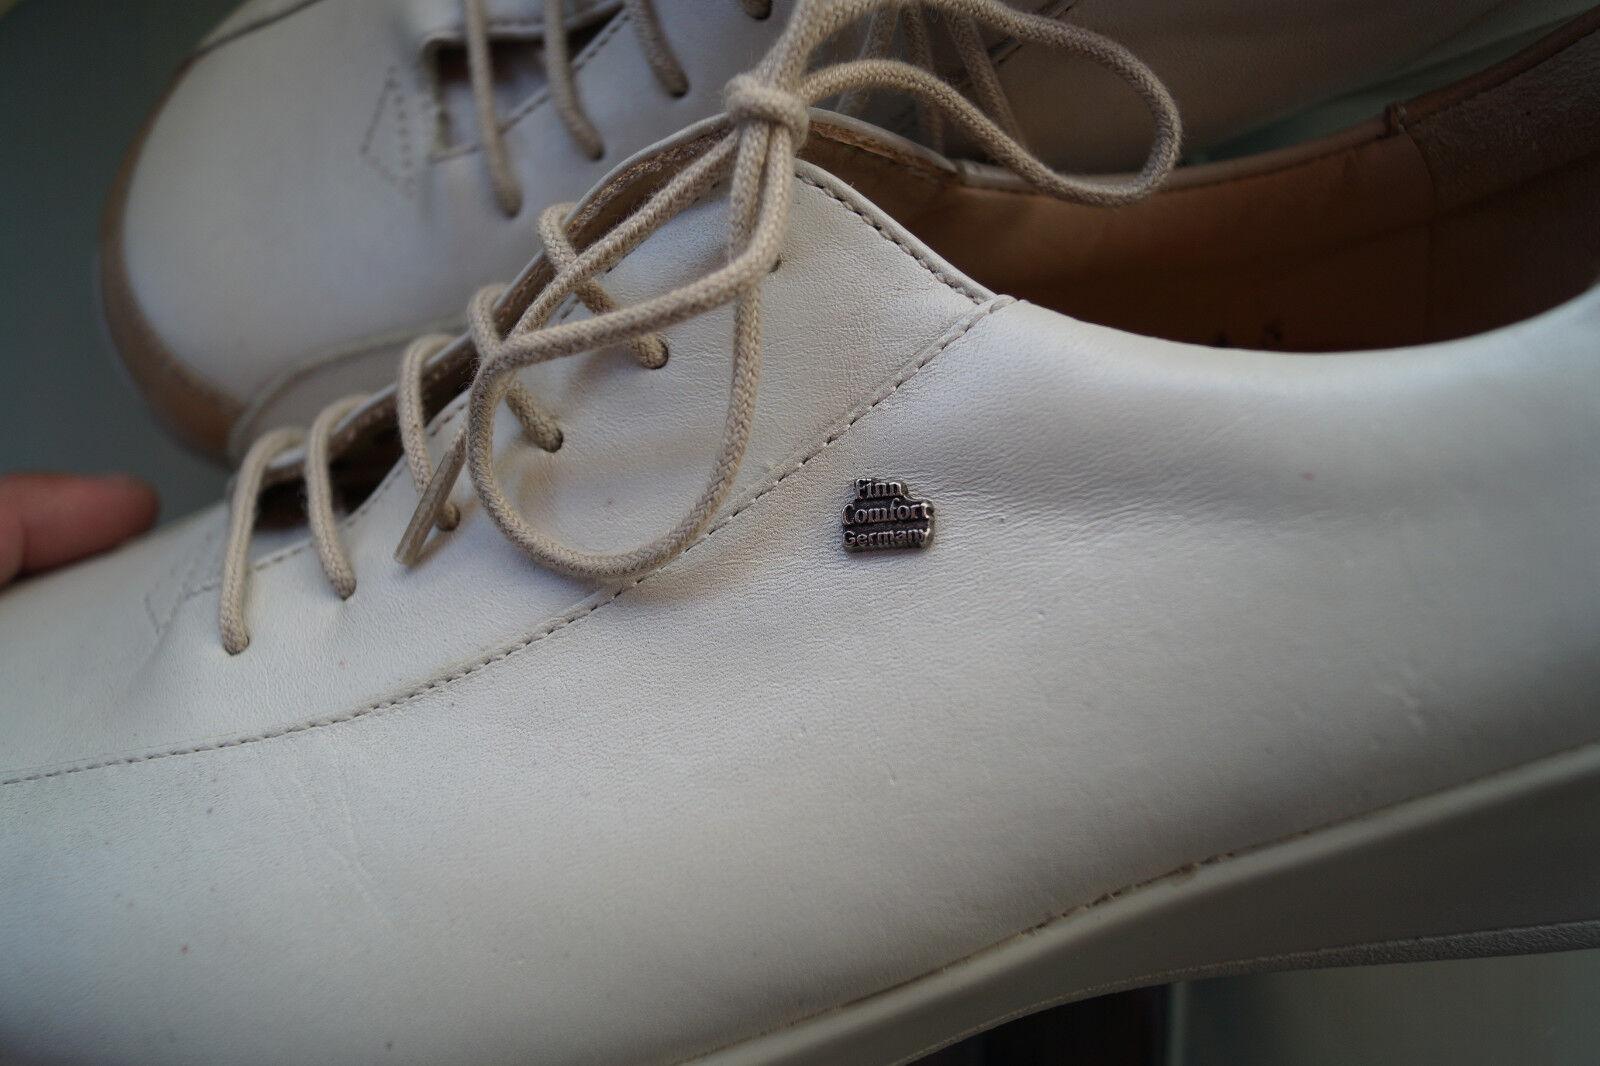 FINN COMFORT Narita Chaussures Femmes Chaussure Lacée Ink 2 Paire Paire Paire dépôts Taille 8 D 42 NEUF ccc3ab